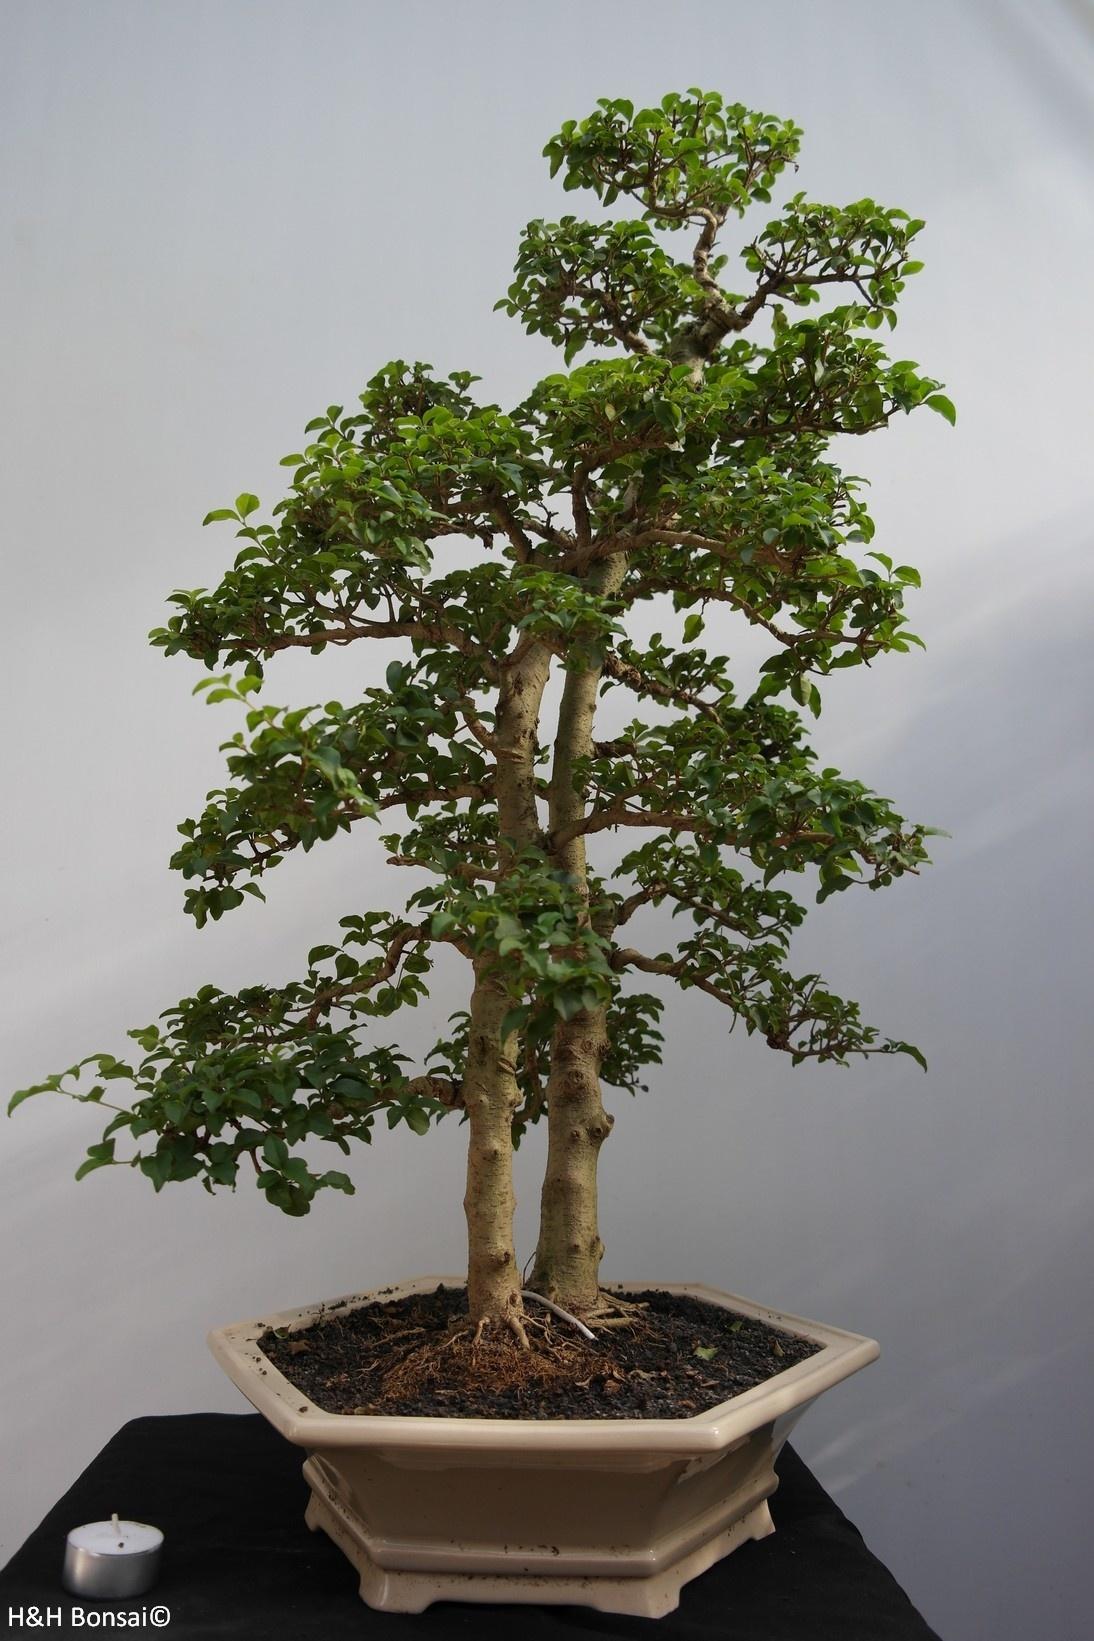 Bonsai Ligustro, Ligustrumsinense, no. 7842